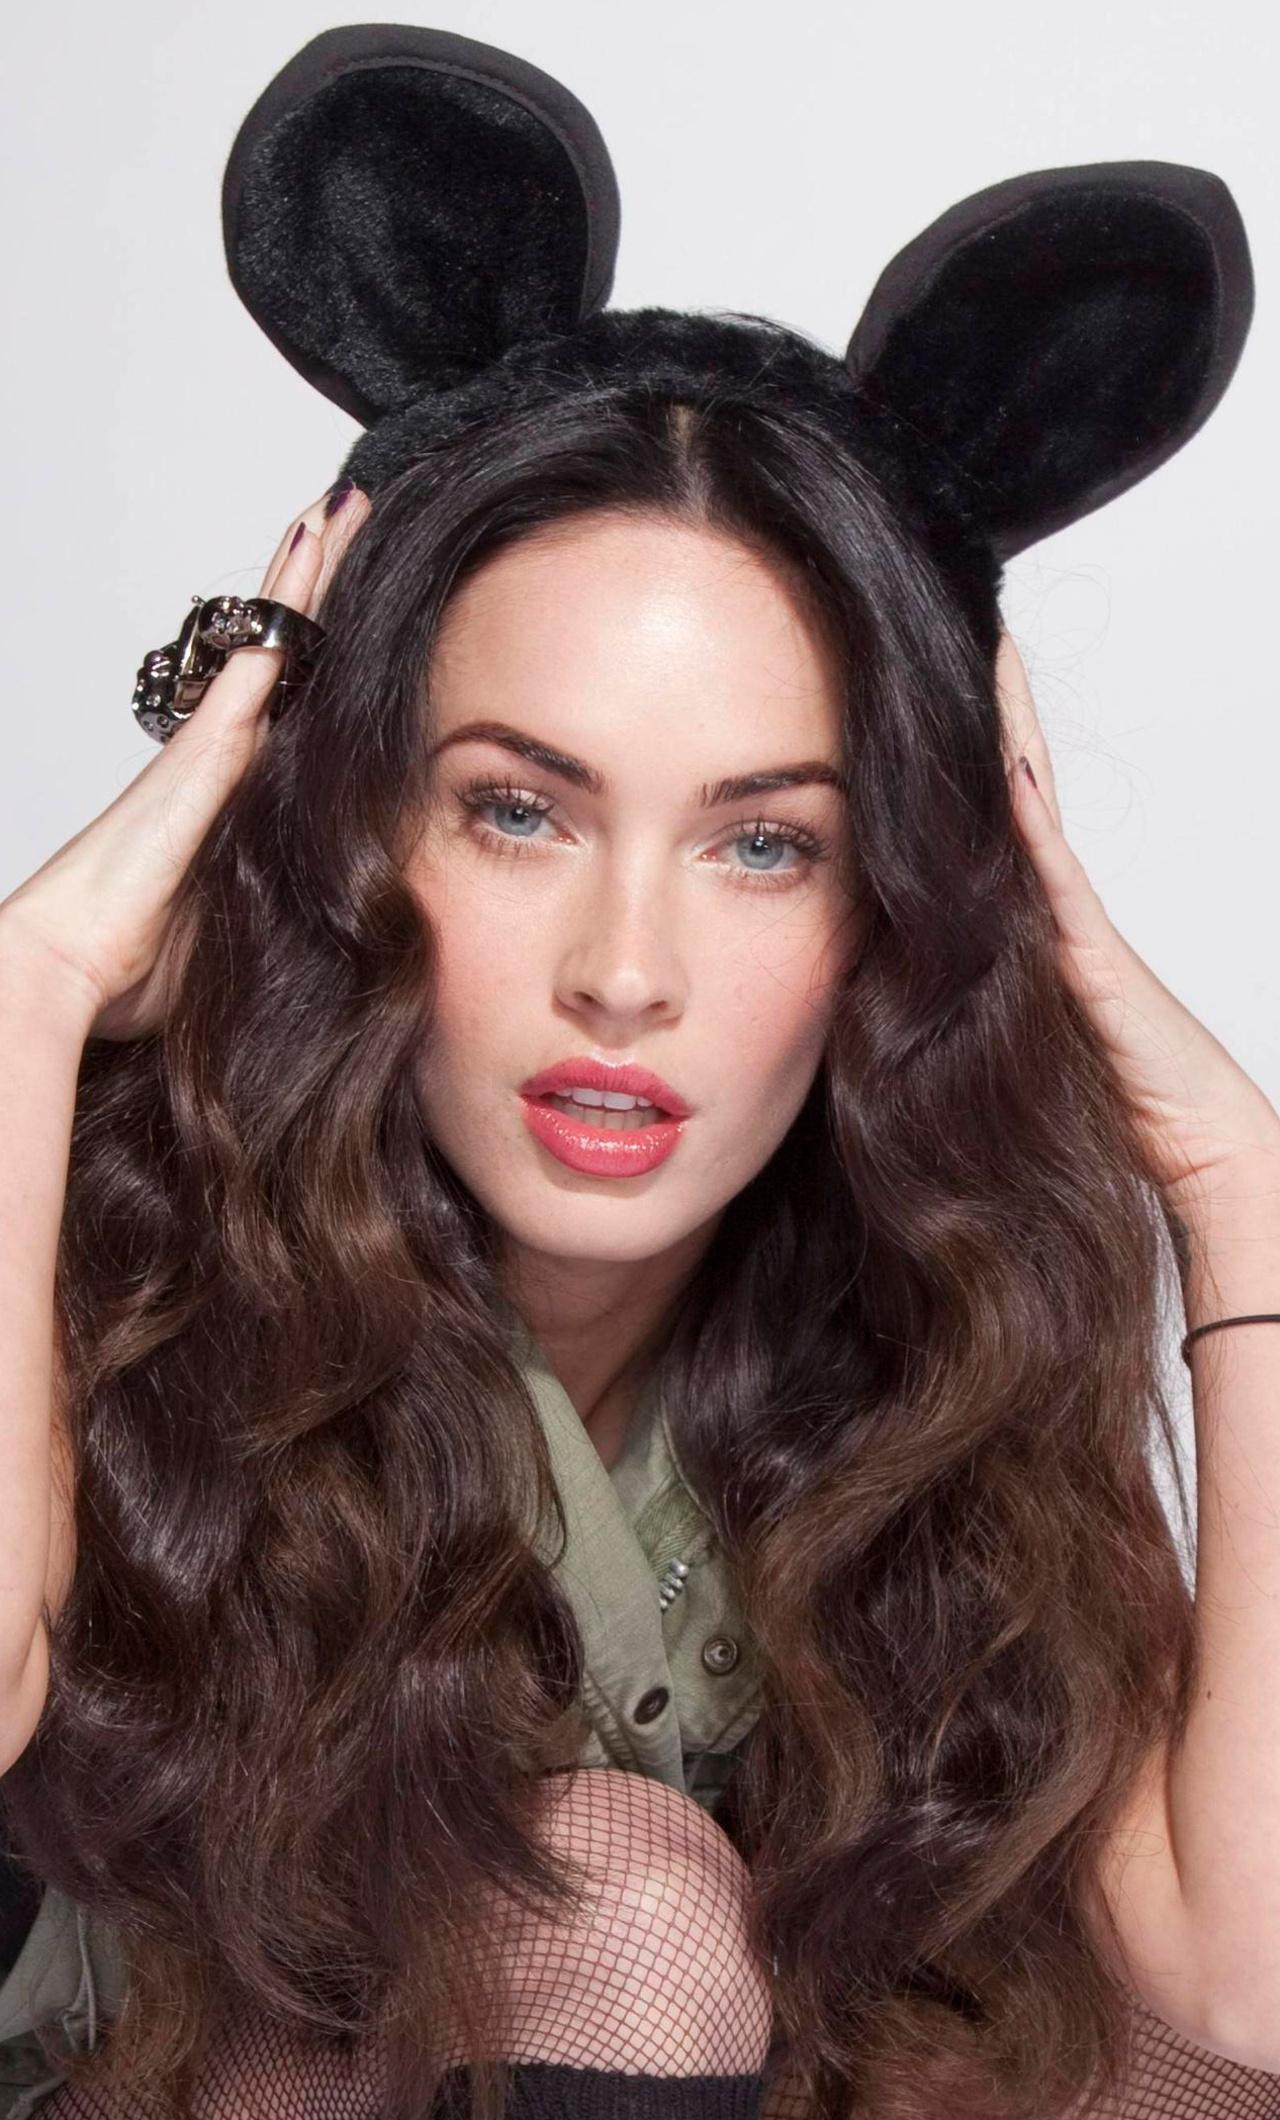 1280x2120 New Megan Fox 4k Iphone 6 Hd 4k Wallpapers